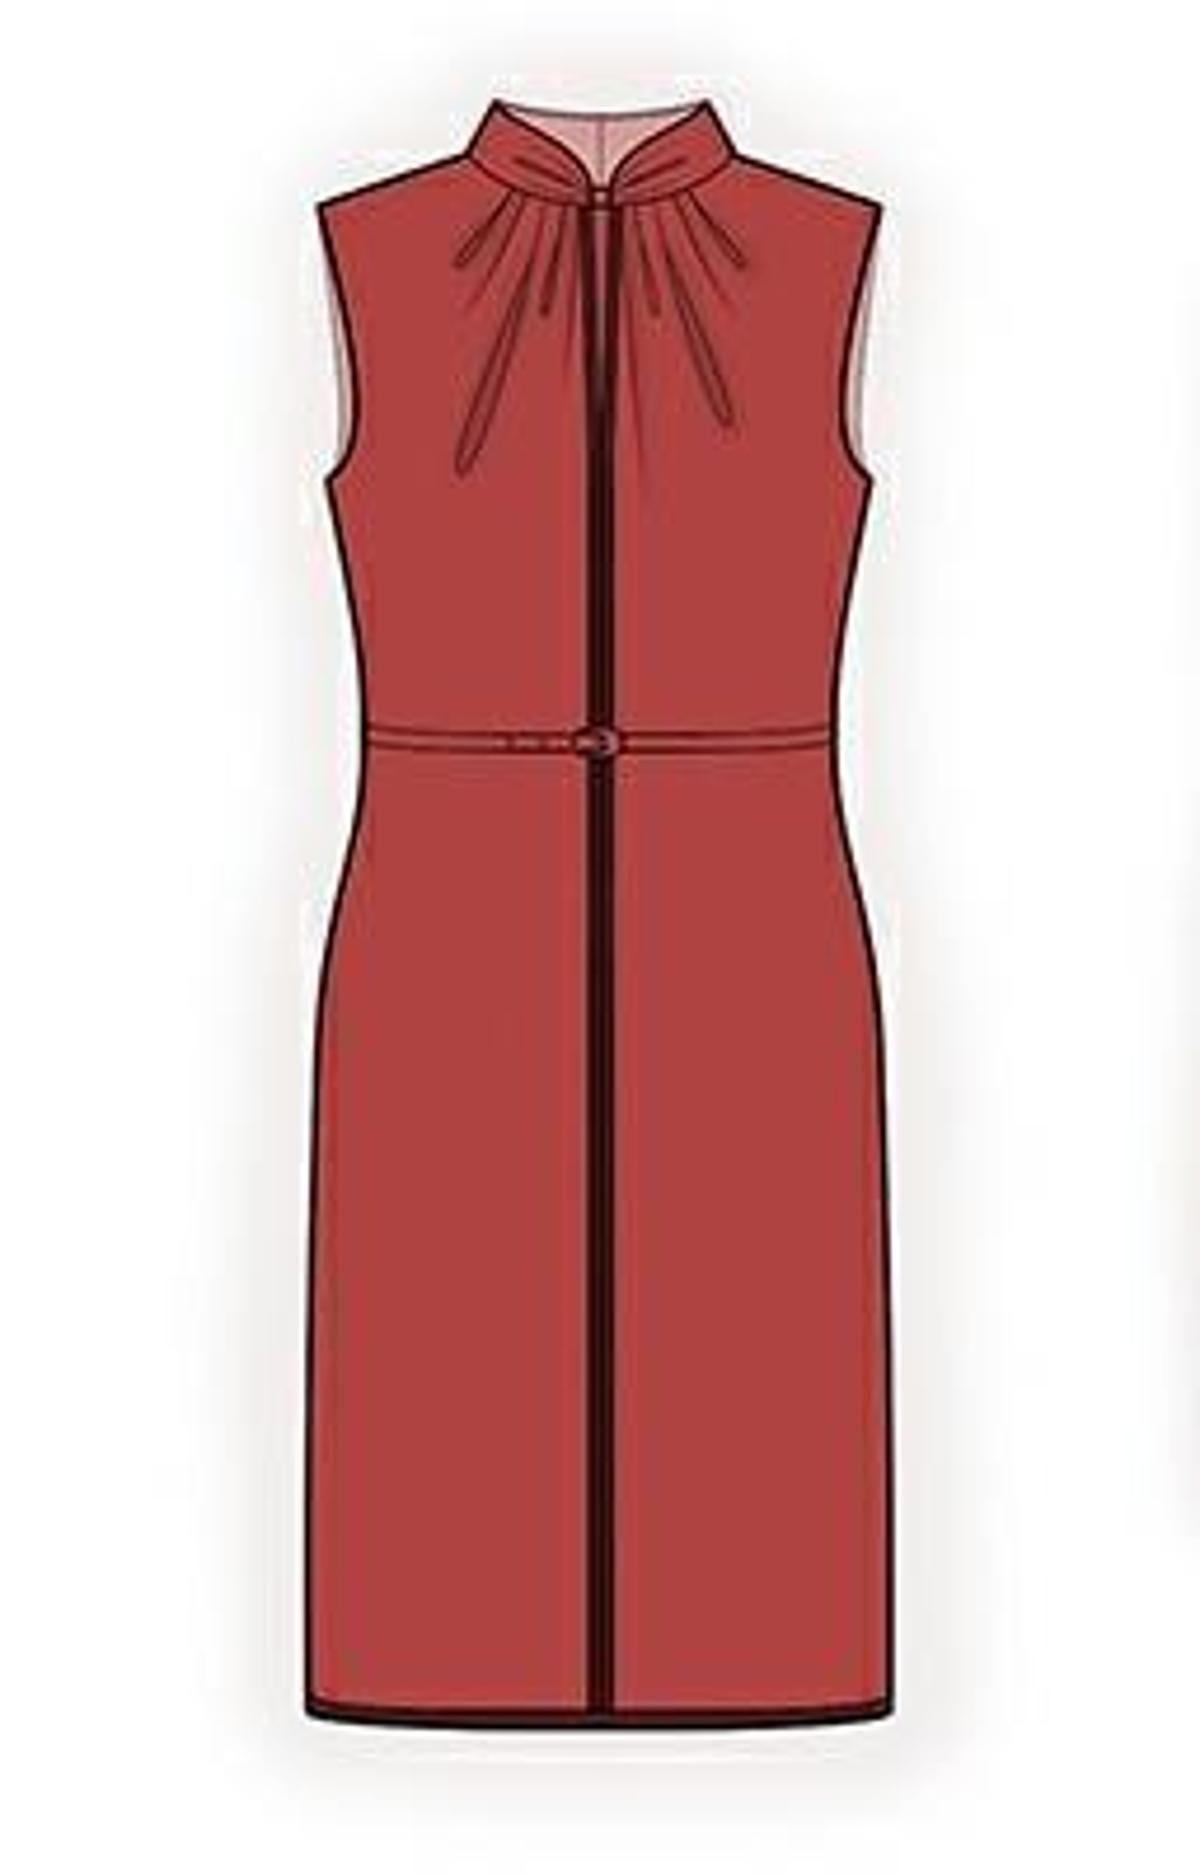 Dress Sewing Pattern 4313 | Craftsy | Fashion illustration